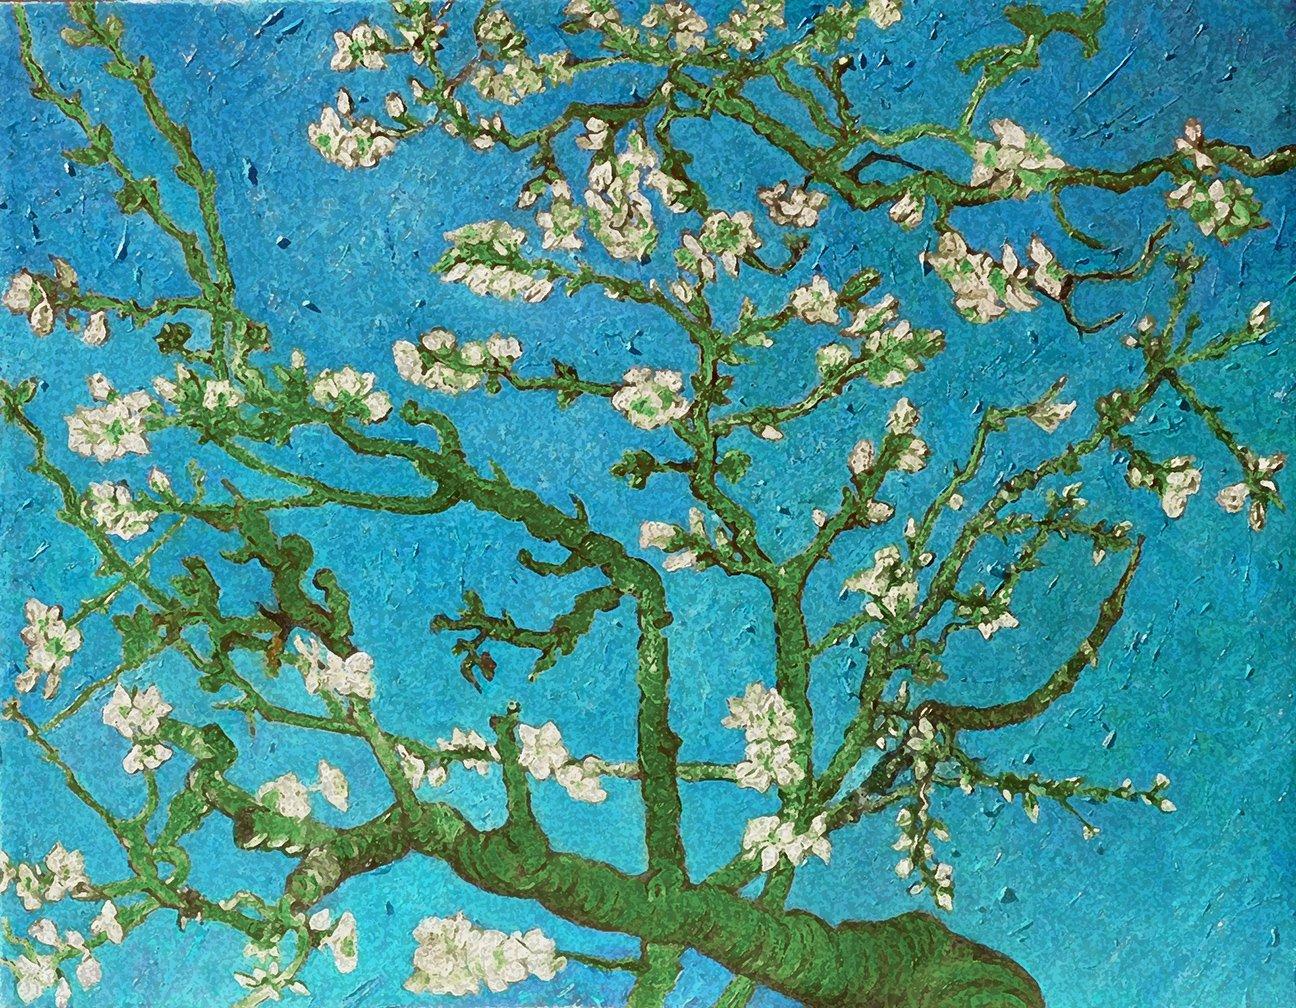 ArtVerse VAN013A1418A Van Goghs Almond Blossom in Blue and Green Removable Art Decal 14 x 18 RetailSource Ltd